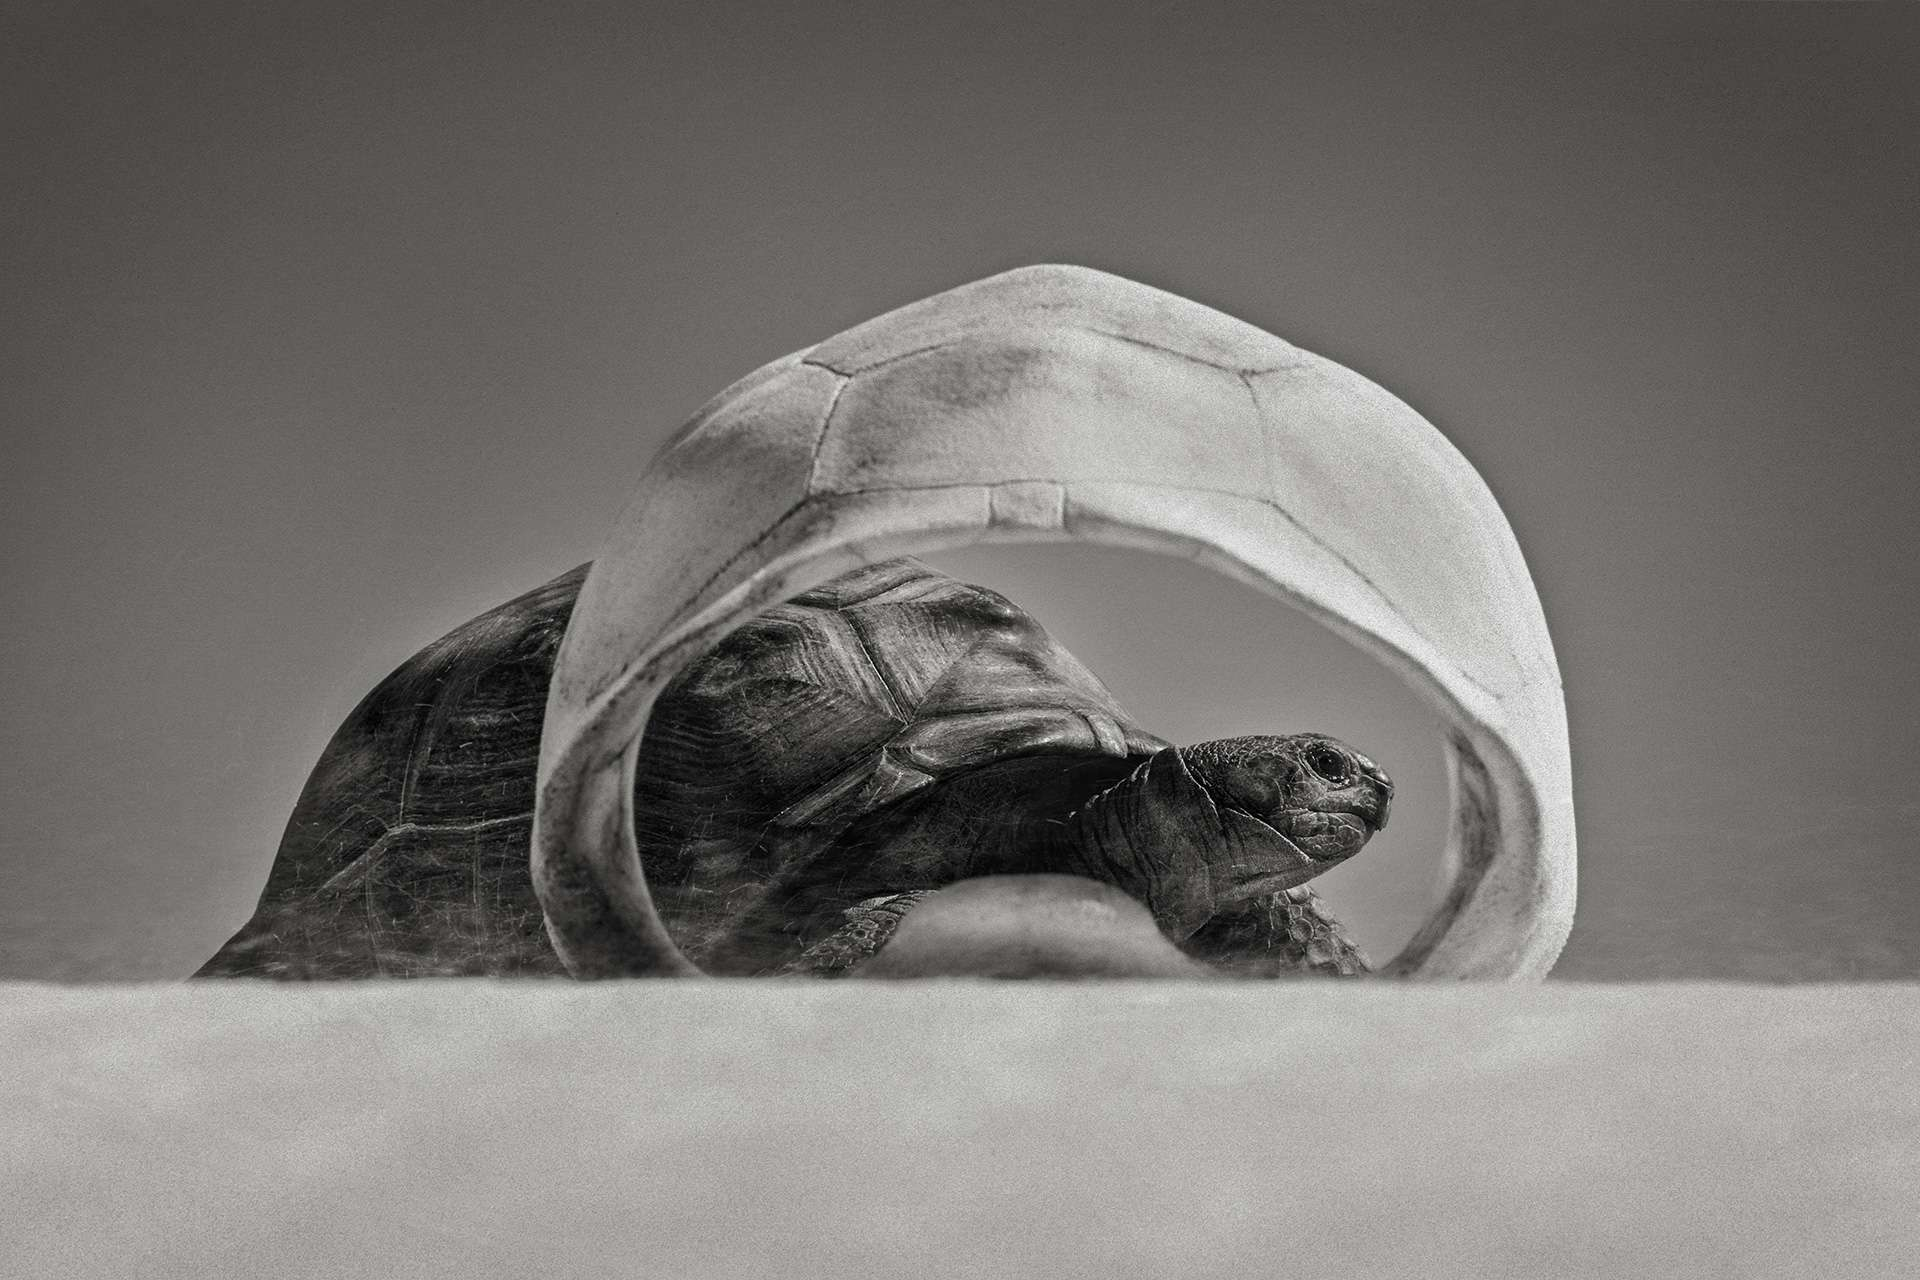 Photographie de Gilles Martin : tortue d'Aldabra, Struggle for life